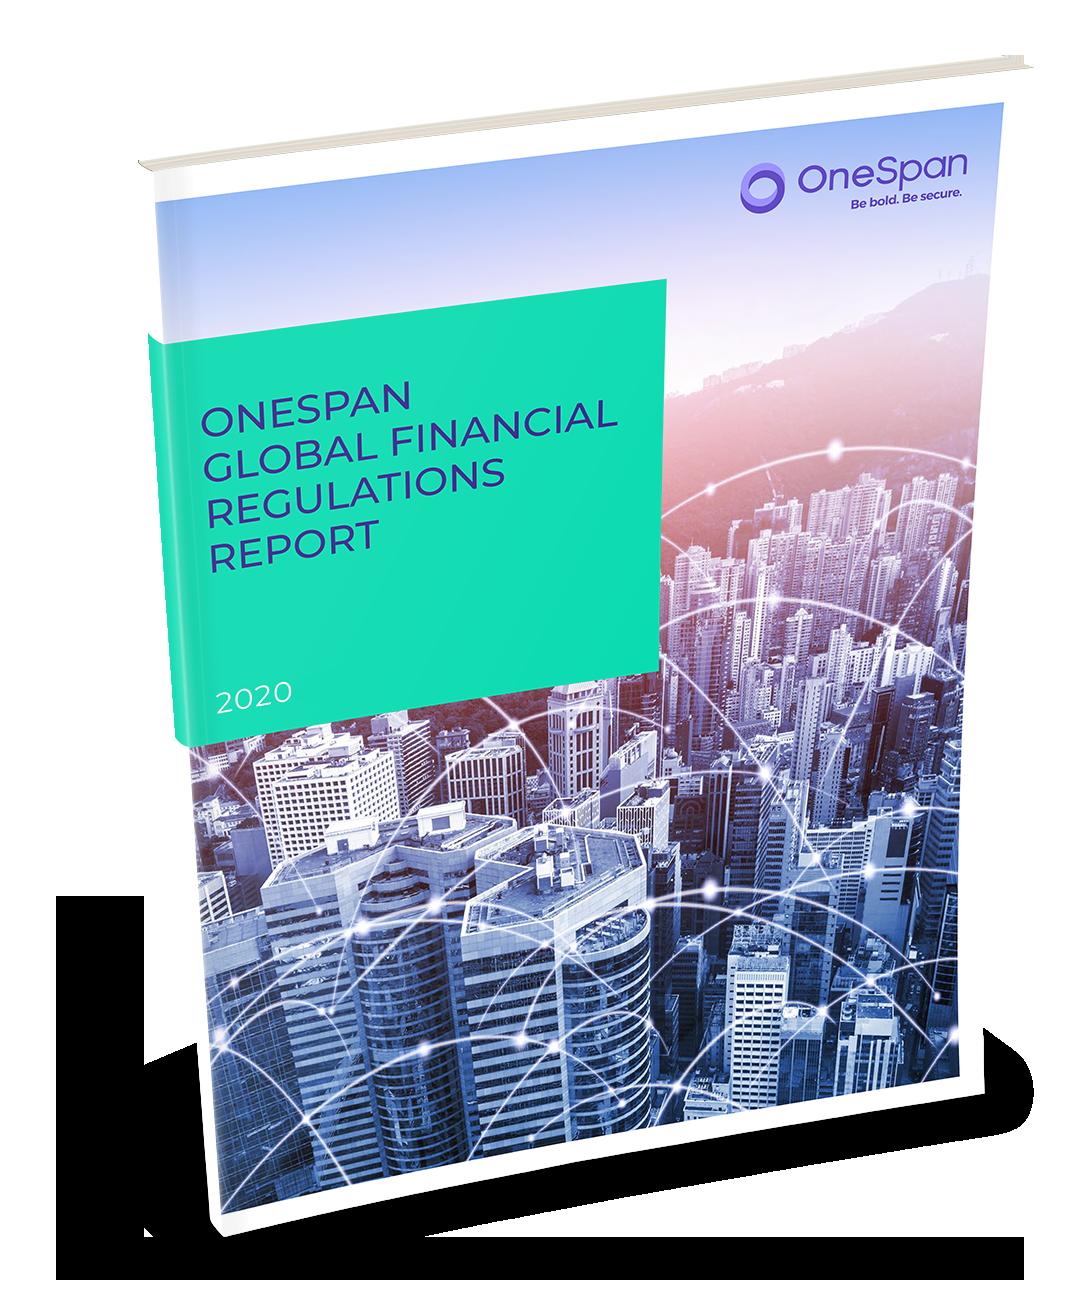 2020 Global Regulatory Financial Report Cover Image